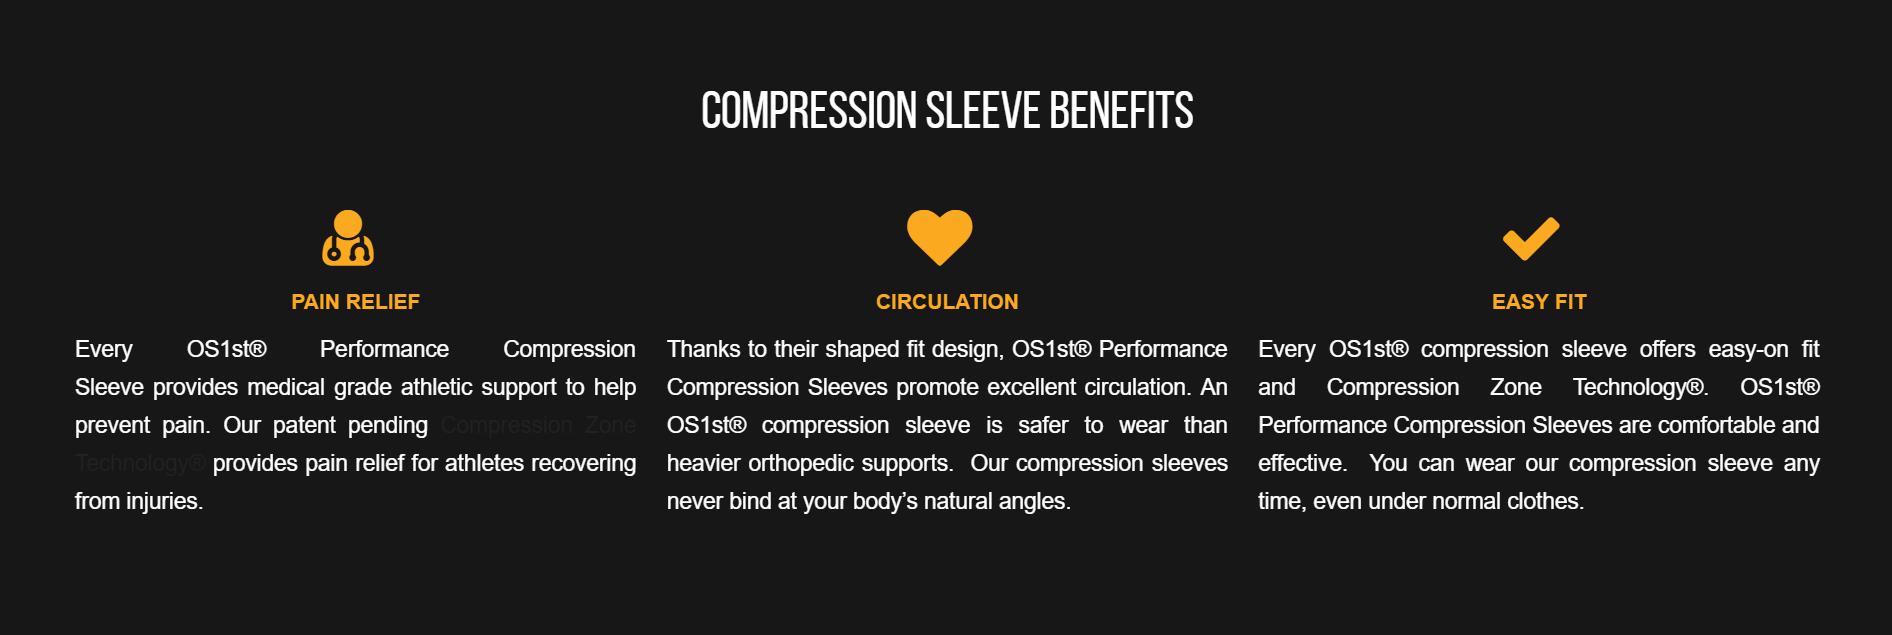 compression sleeve benefits